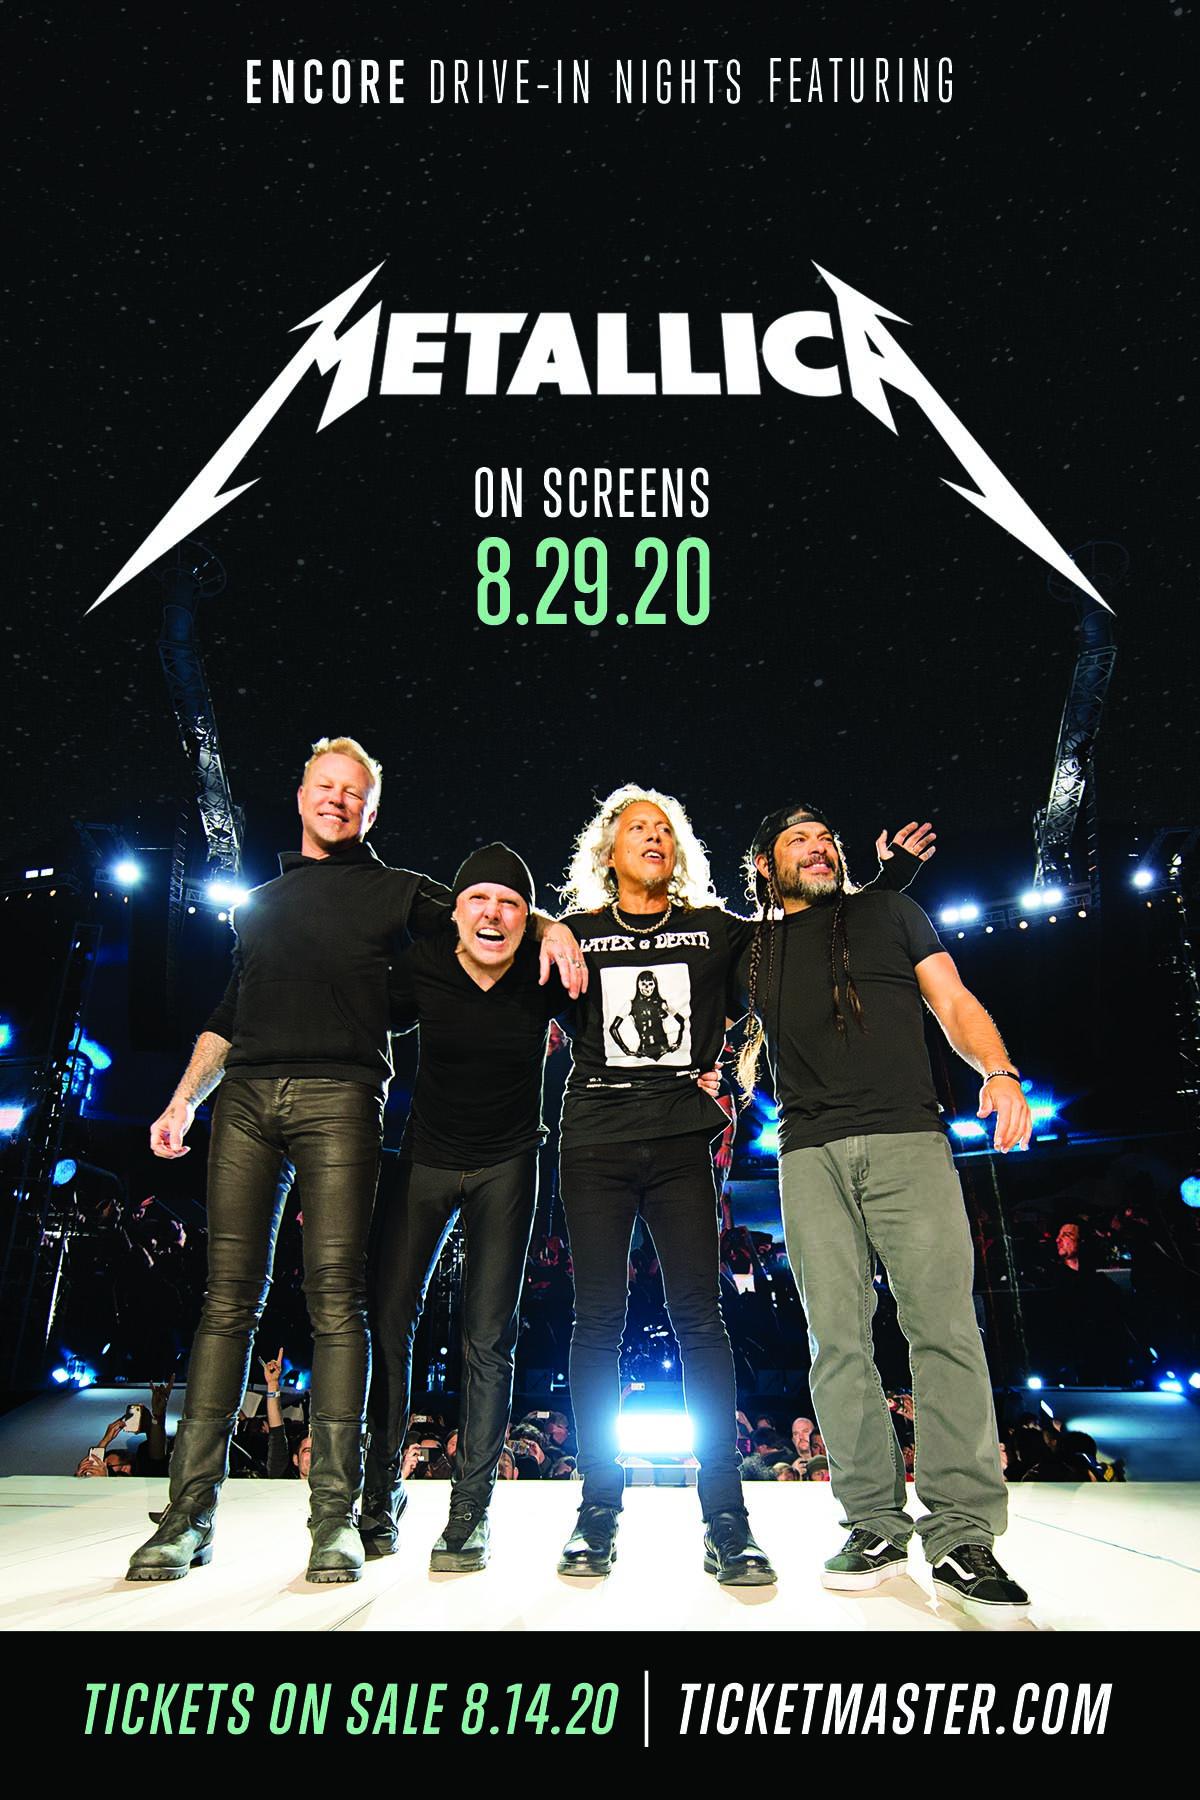 Metallica Drive-In Contest